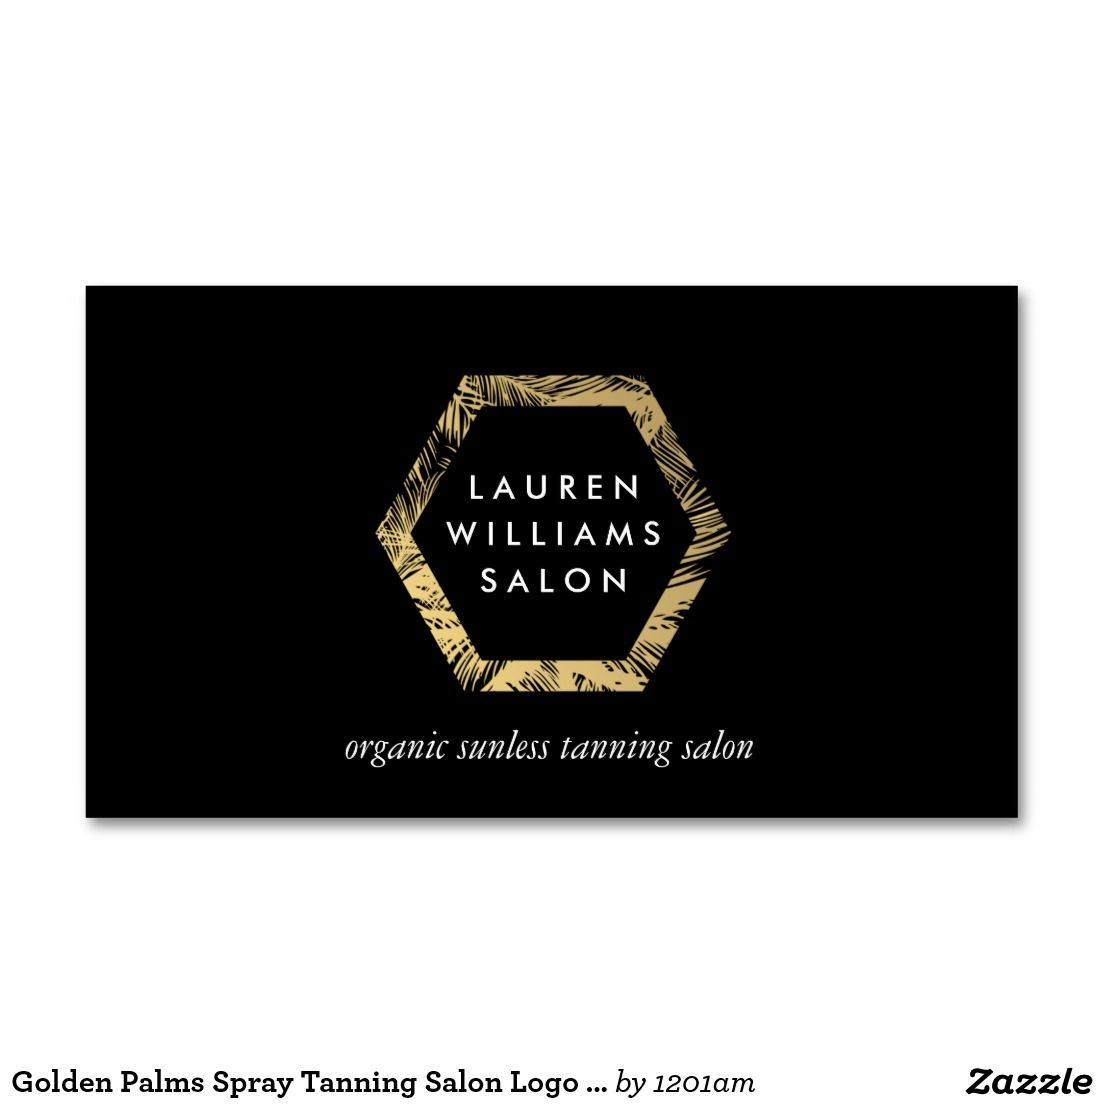 Golden Palms Spray Tanning Salon Logo on Black Business Card ...